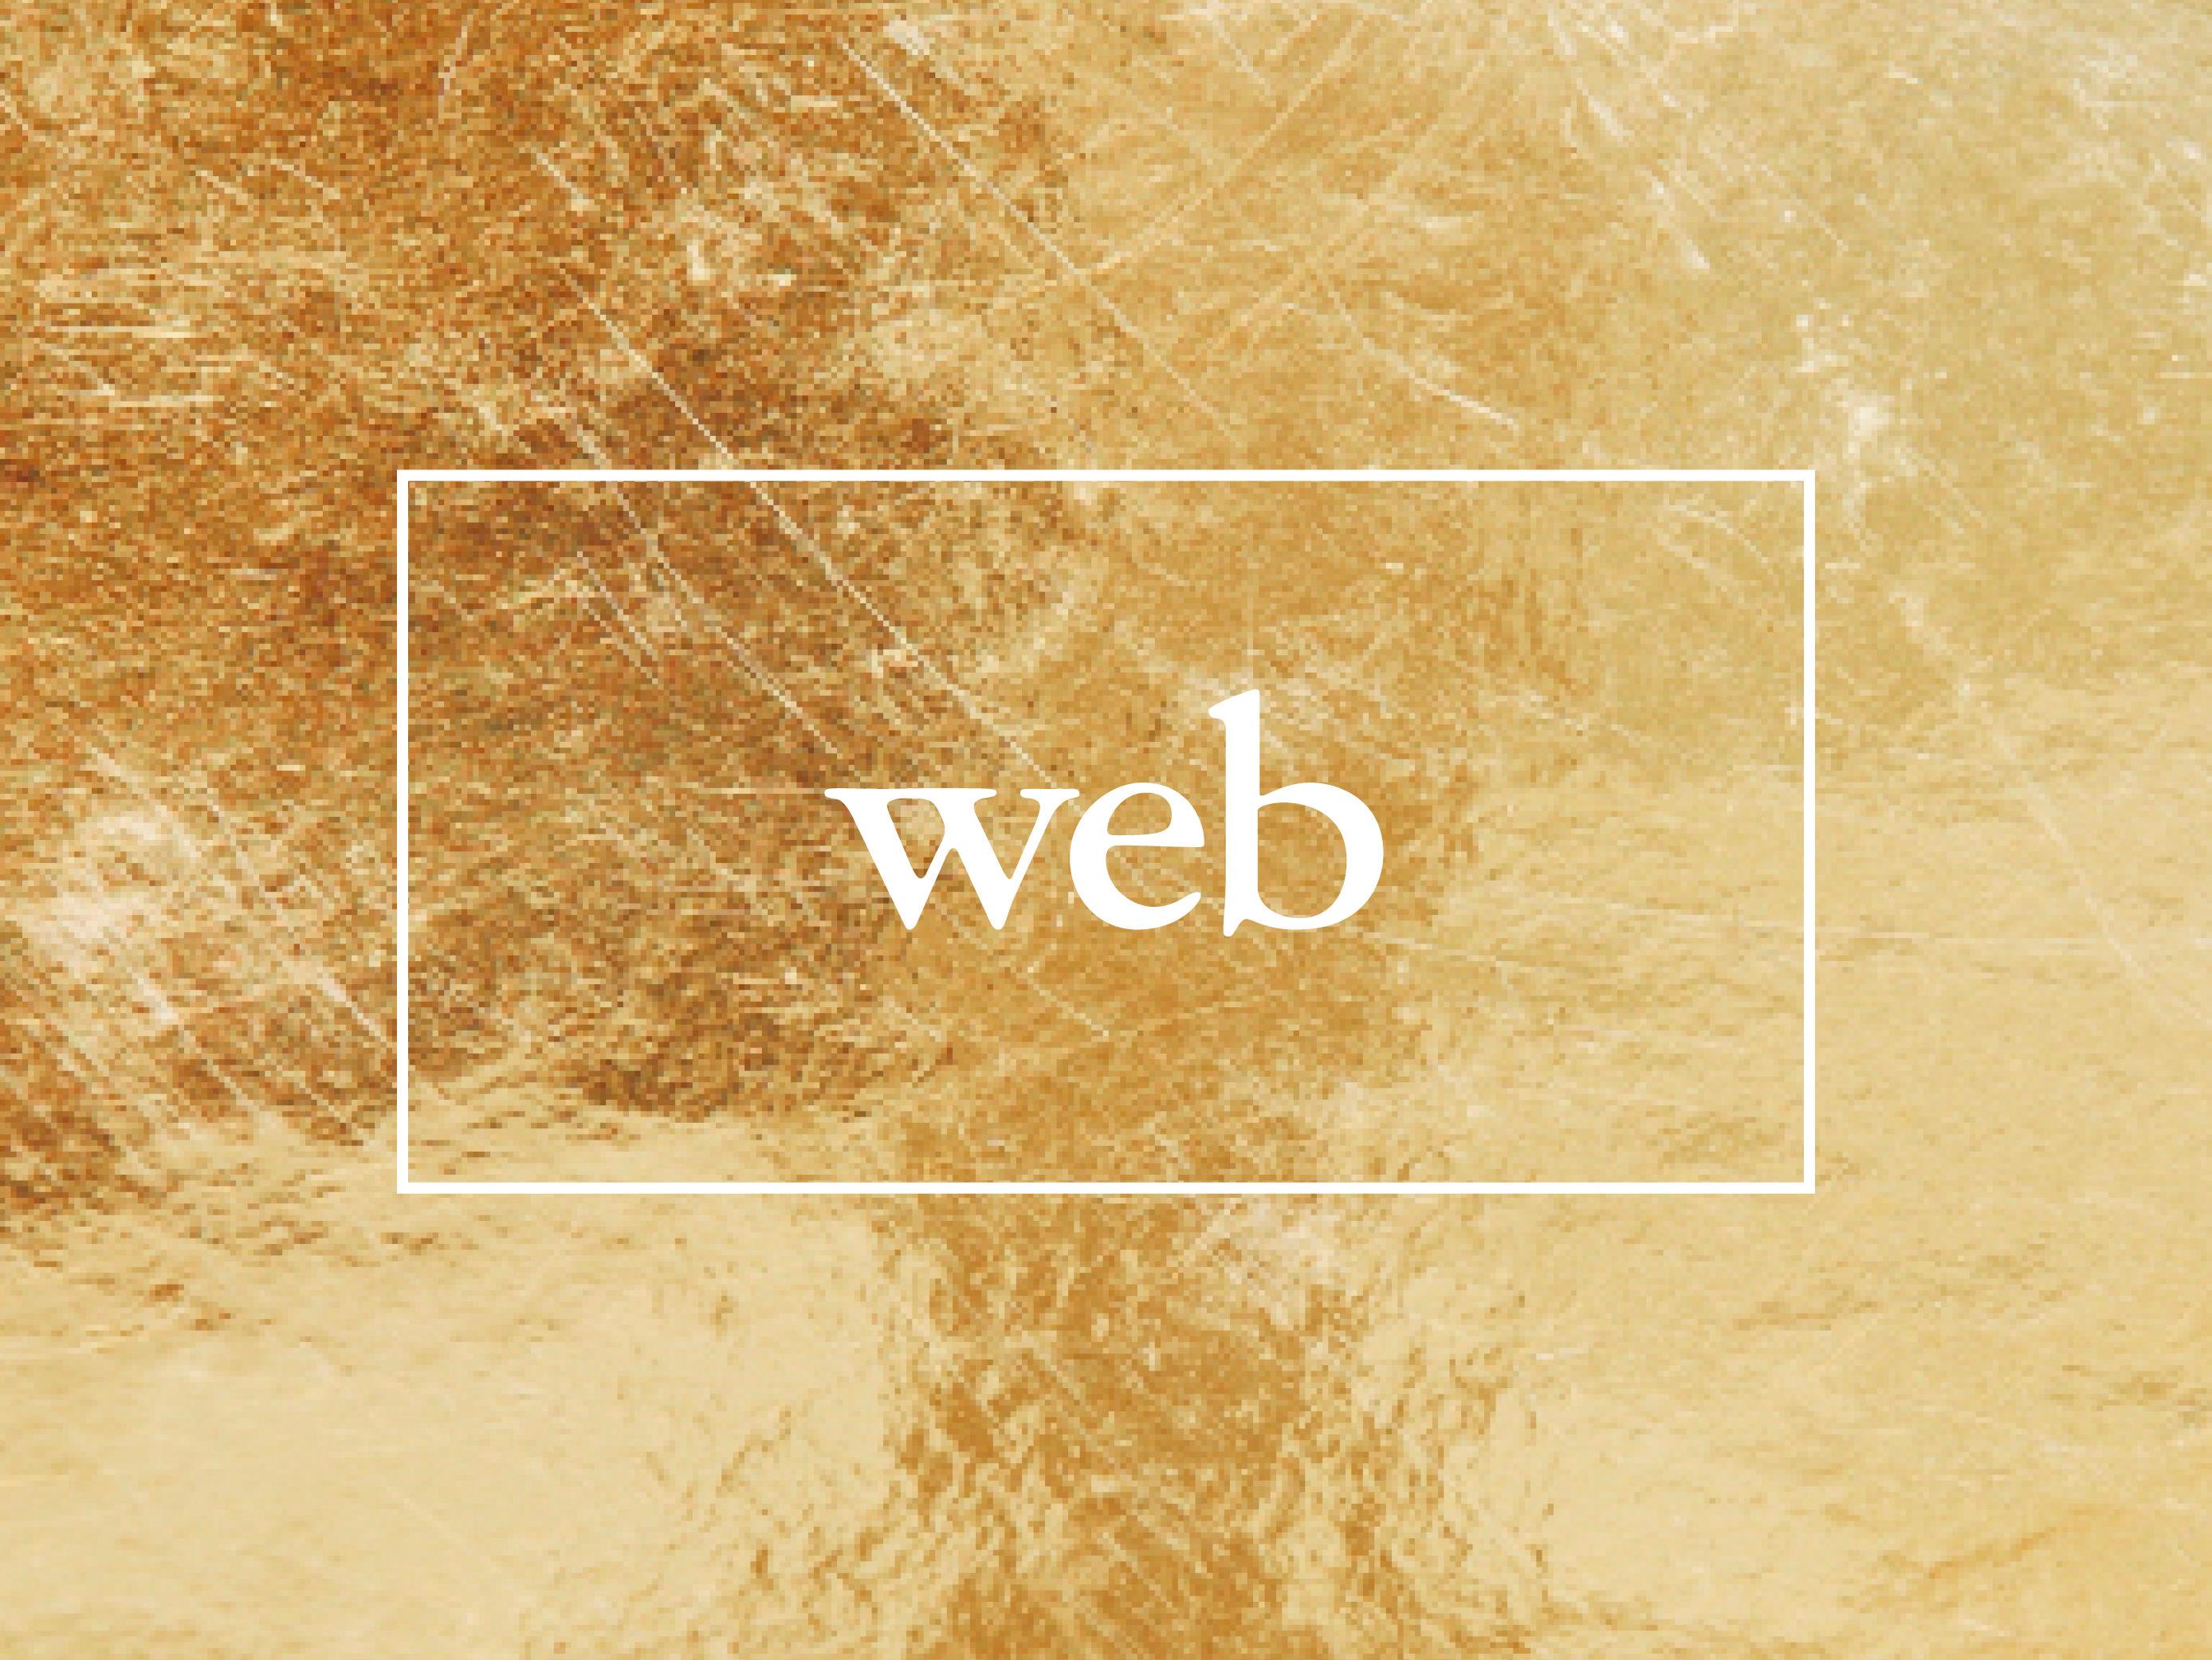 GDGB Web Design